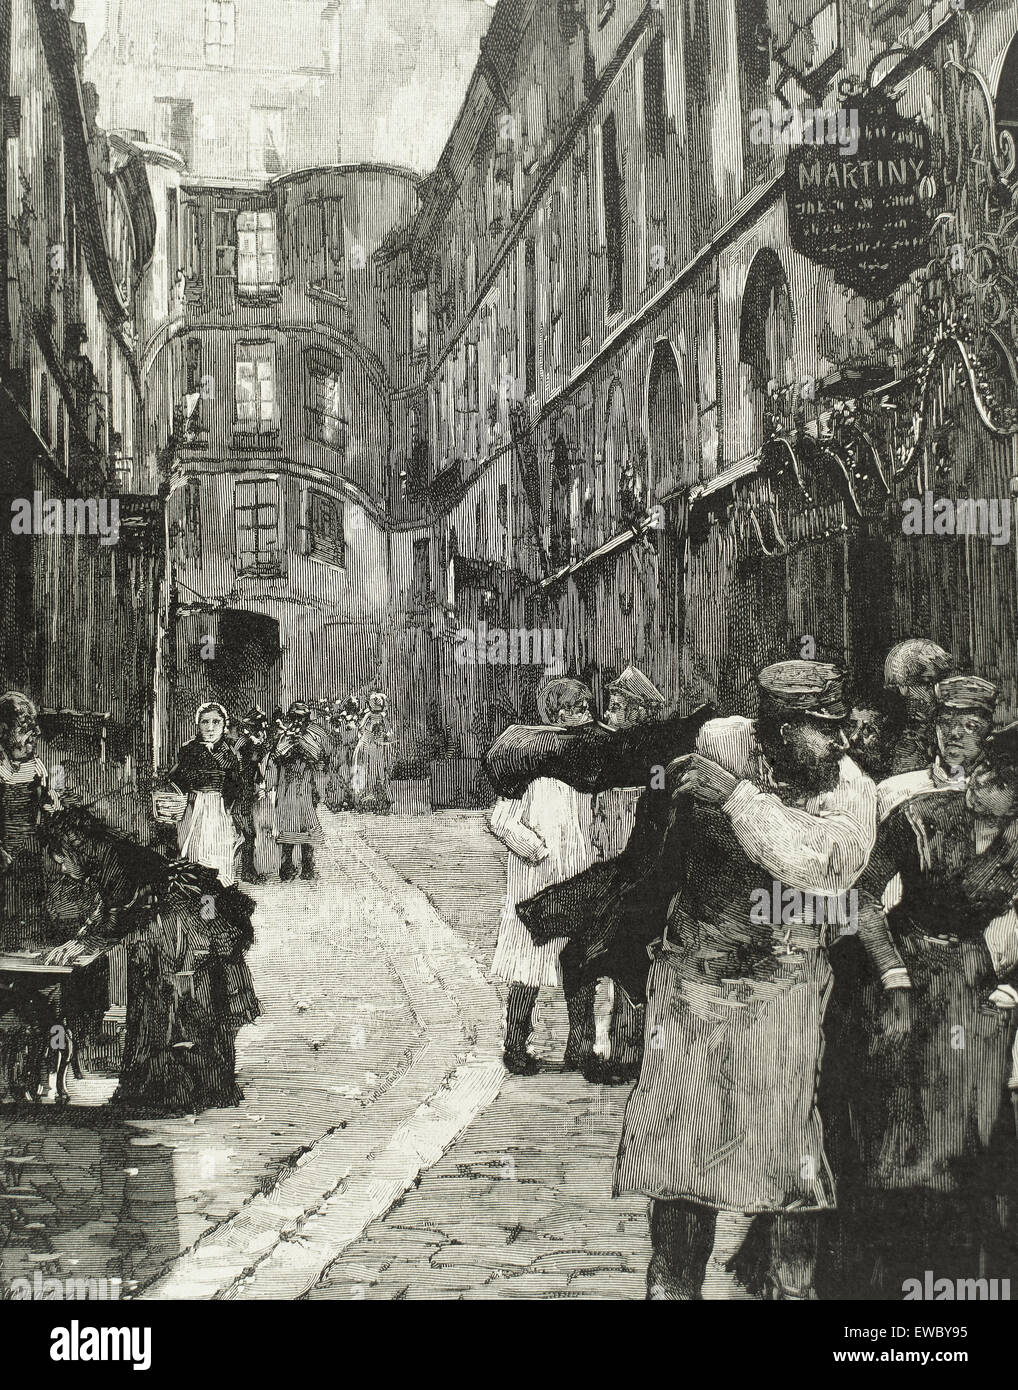 France. Paris. Old town. Dragon street, 1885. Engraving 19th century. - Stock Image